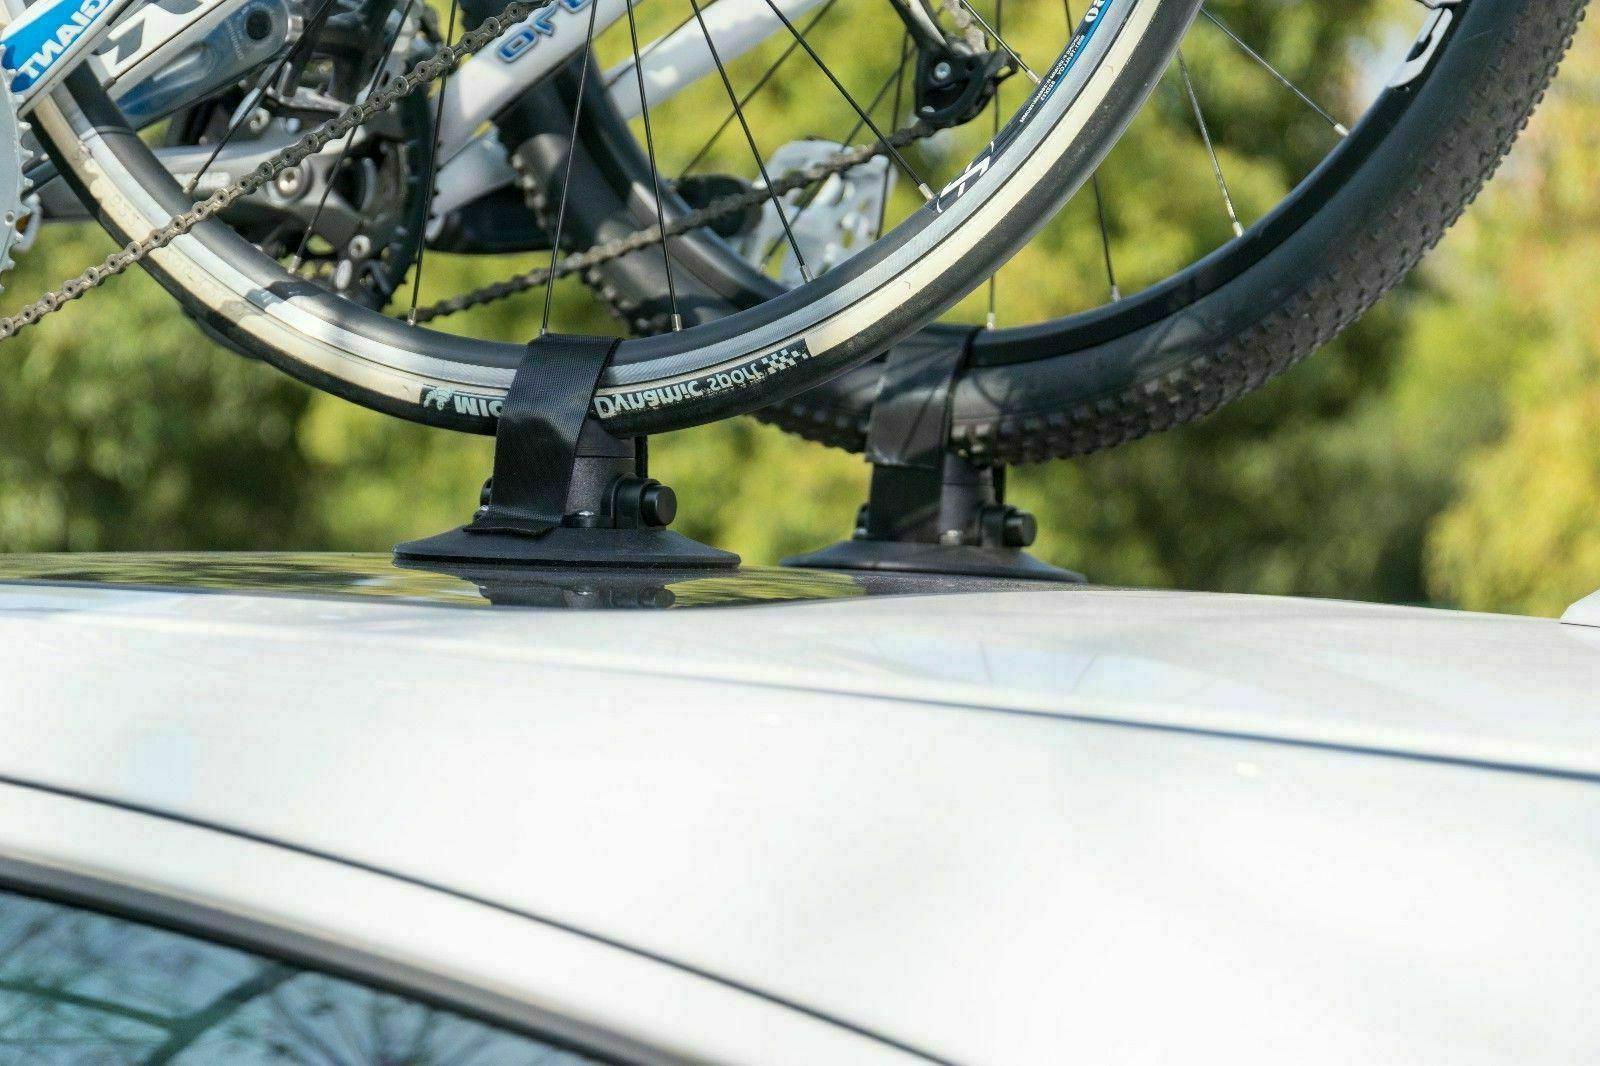 ROCKBROS Roof Sucker Bike Quick 1-bike US